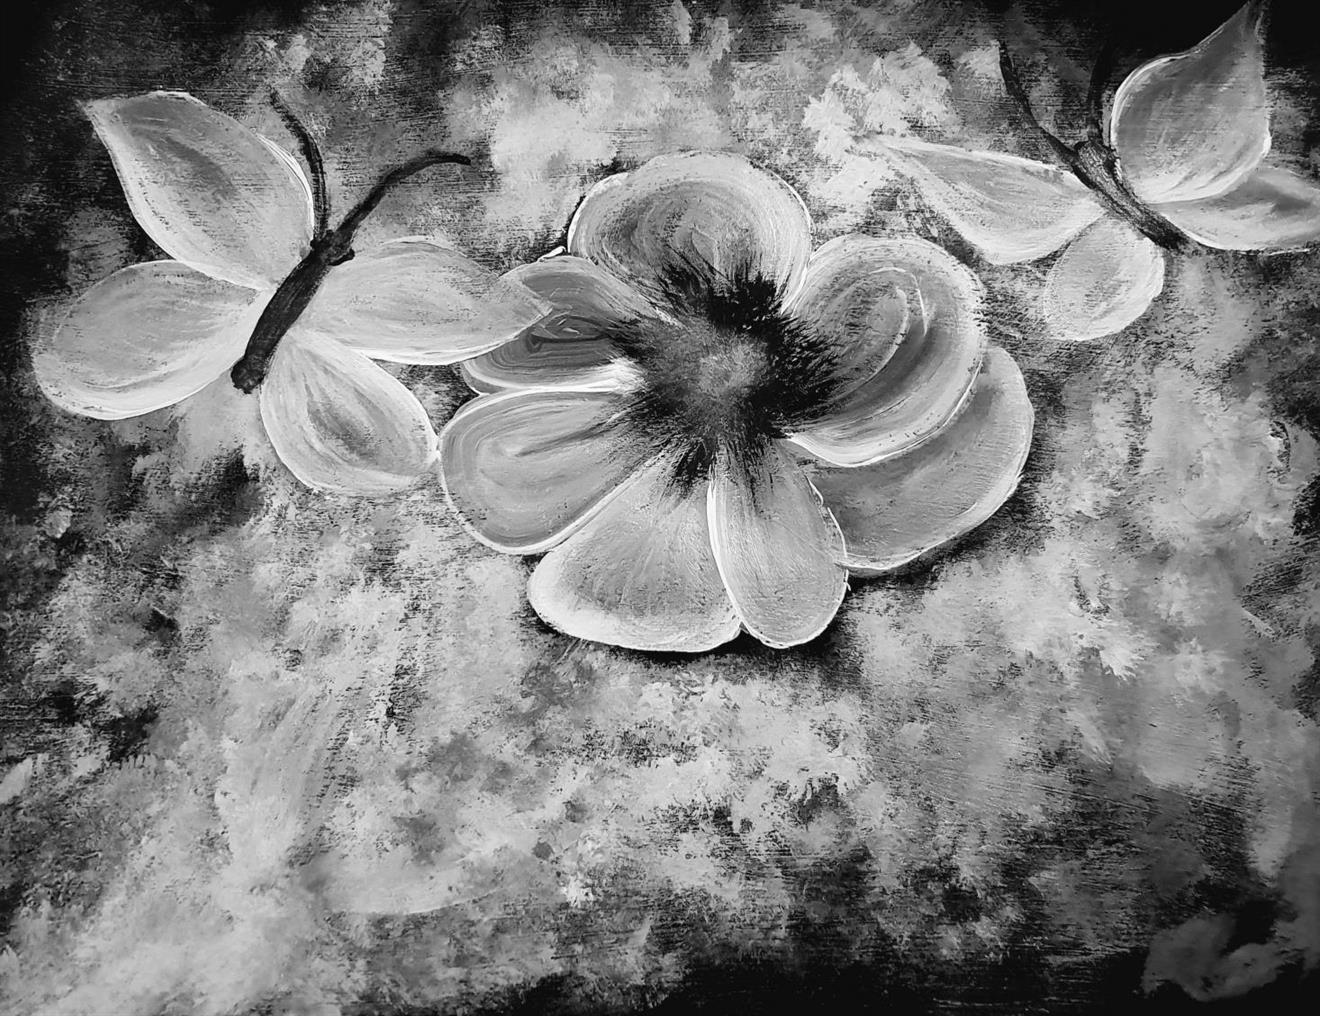 Fotoposters  30x40 cm,fjäril svart-vitt